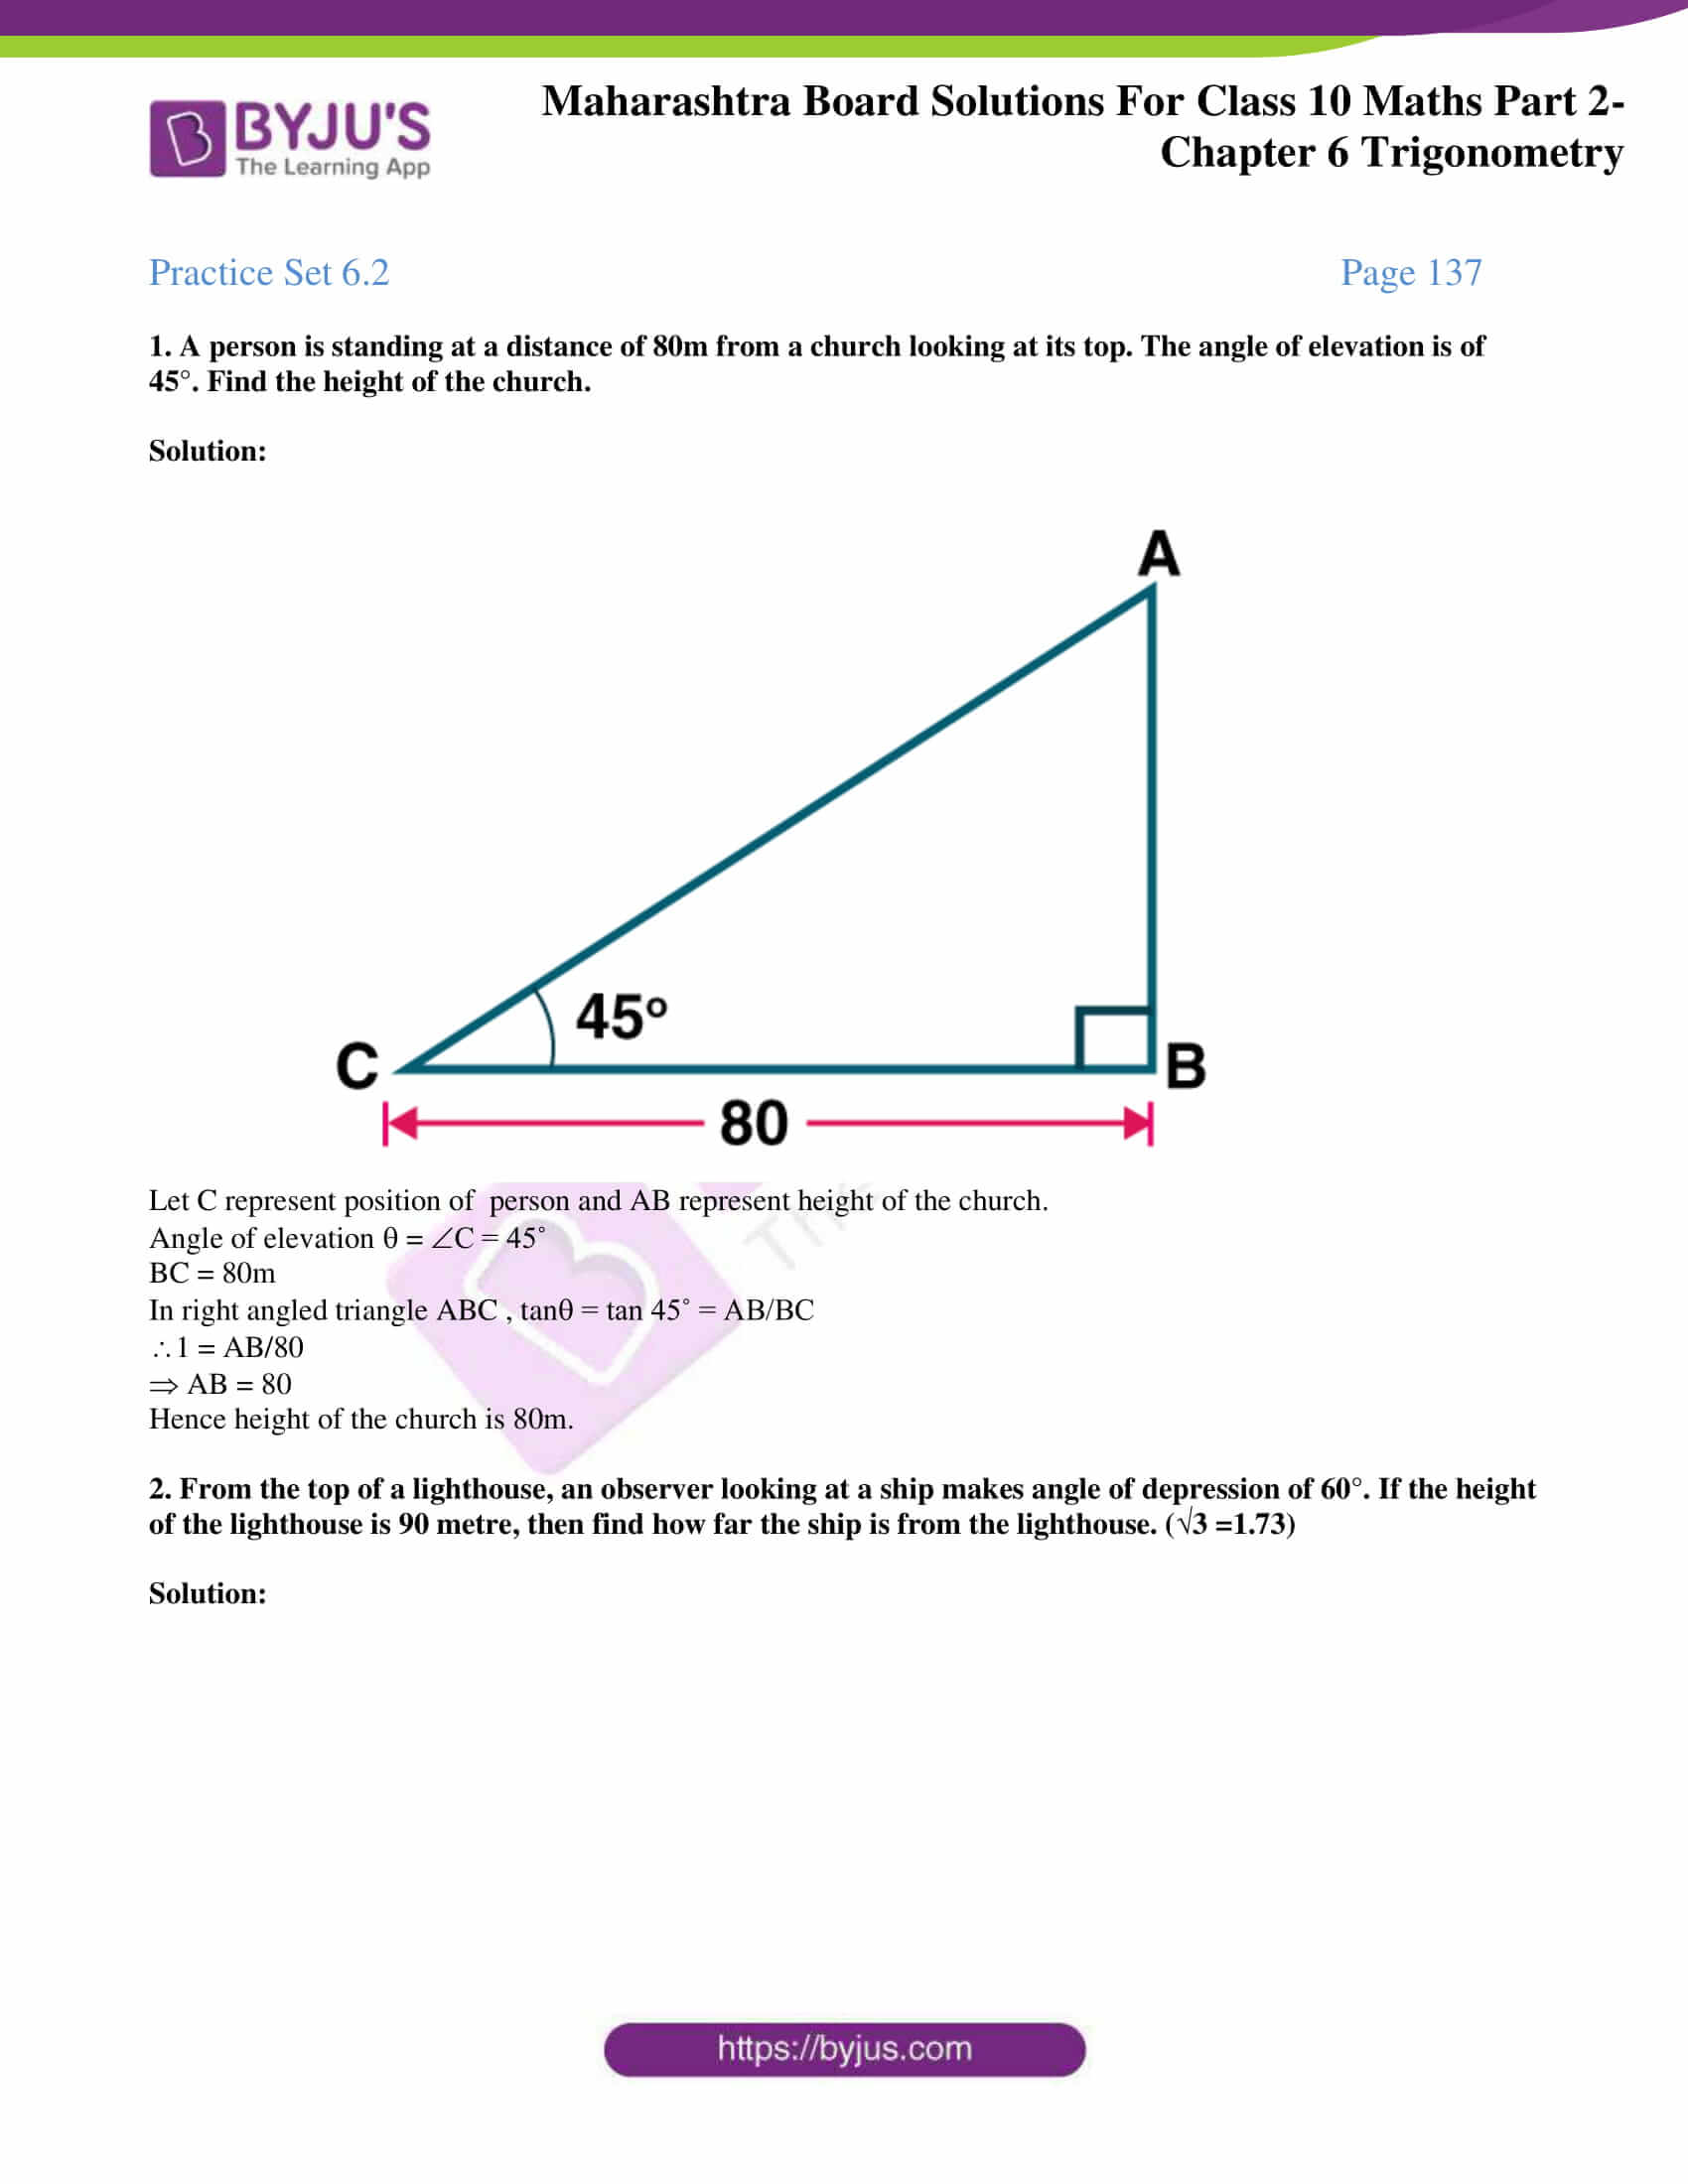 msbshse sol class 10 maths part 2 chapter 6 04